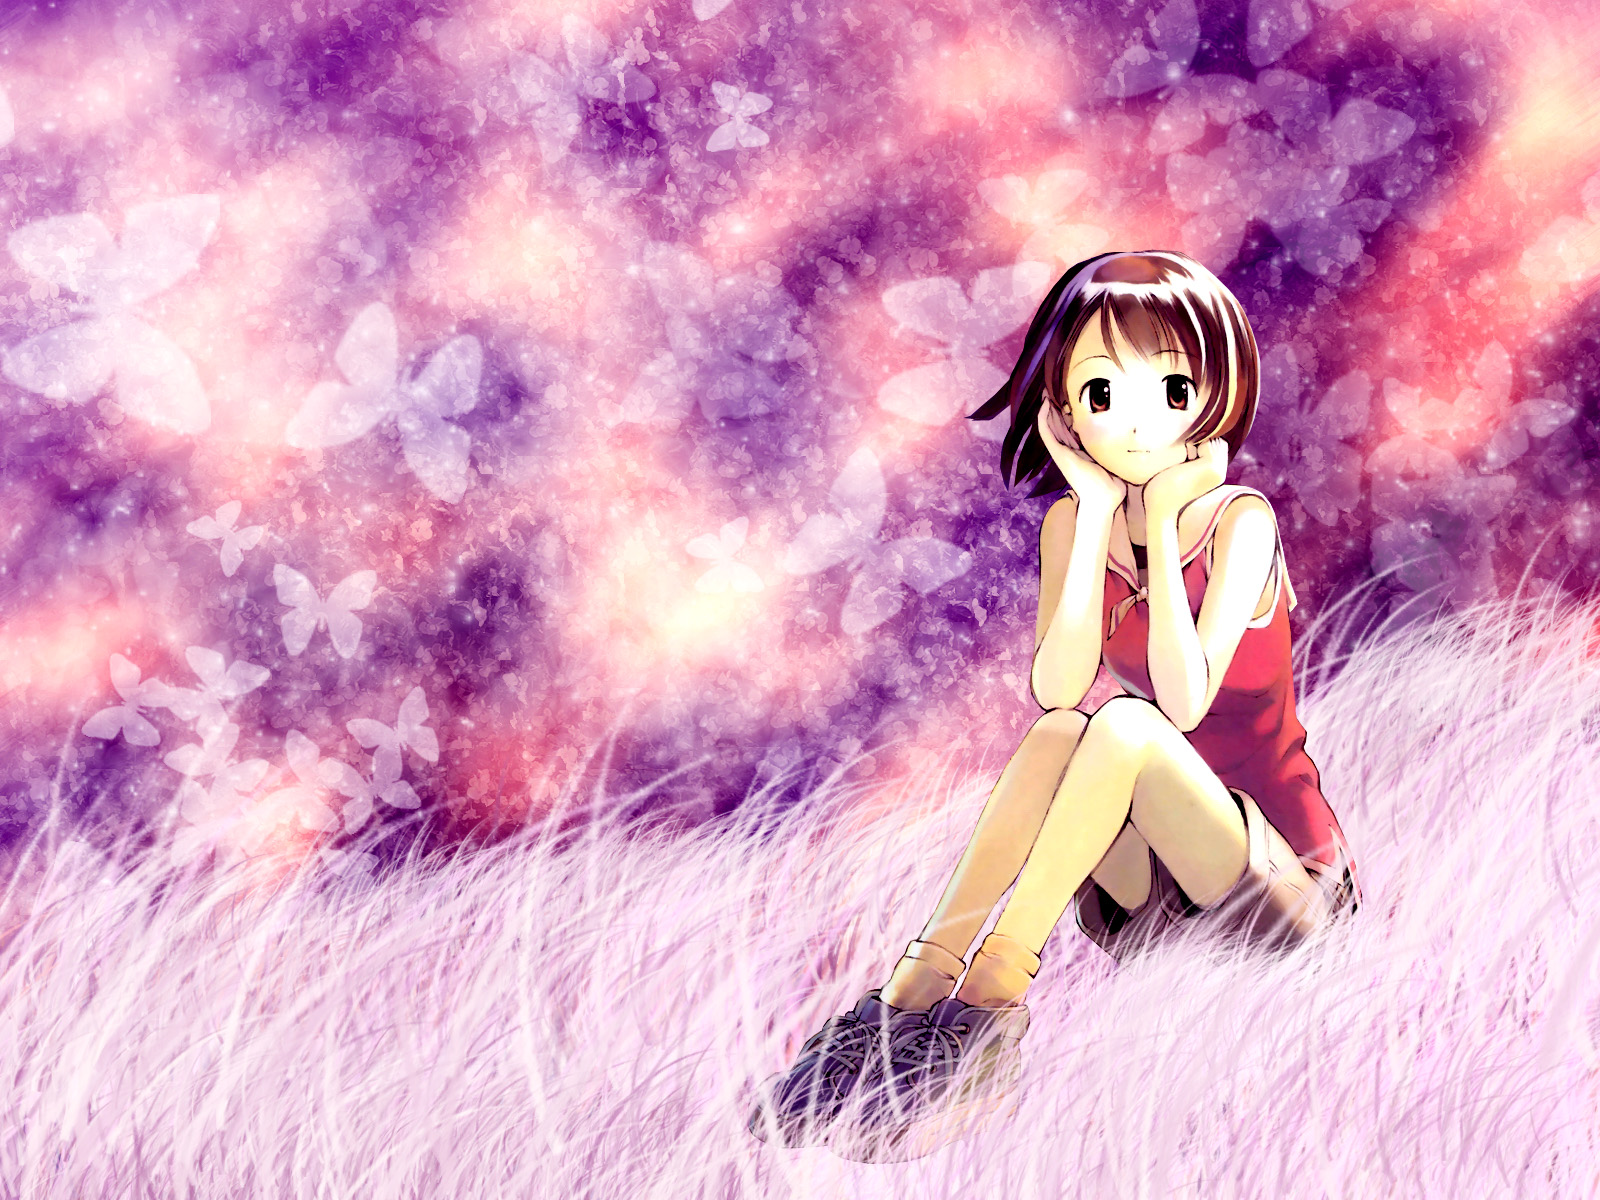 free desktop wallpaper of cute anime girl free computer desktop